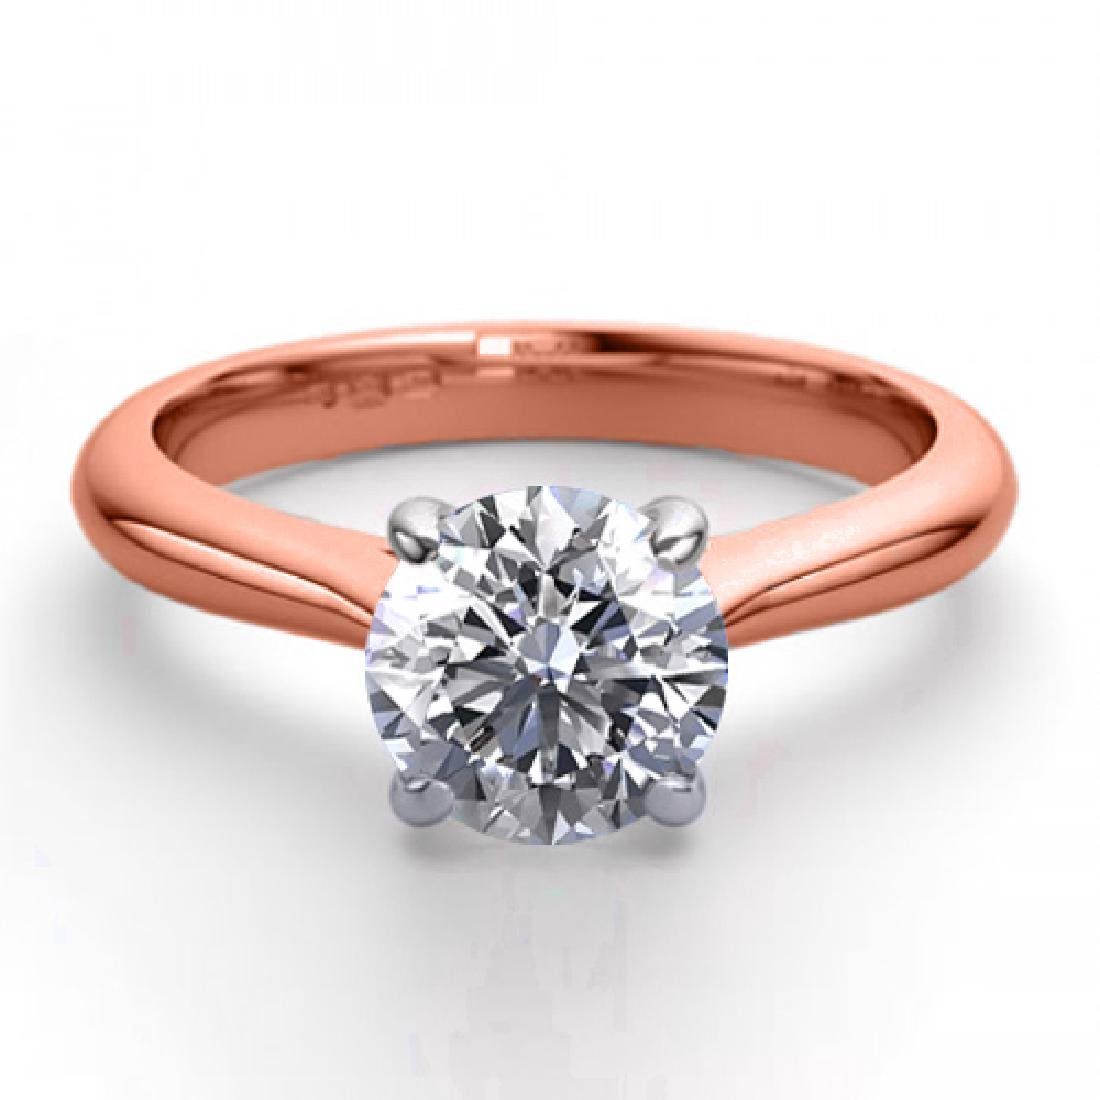 14K Rose Gold Jewelry 1.36 ctw Natural Diamond